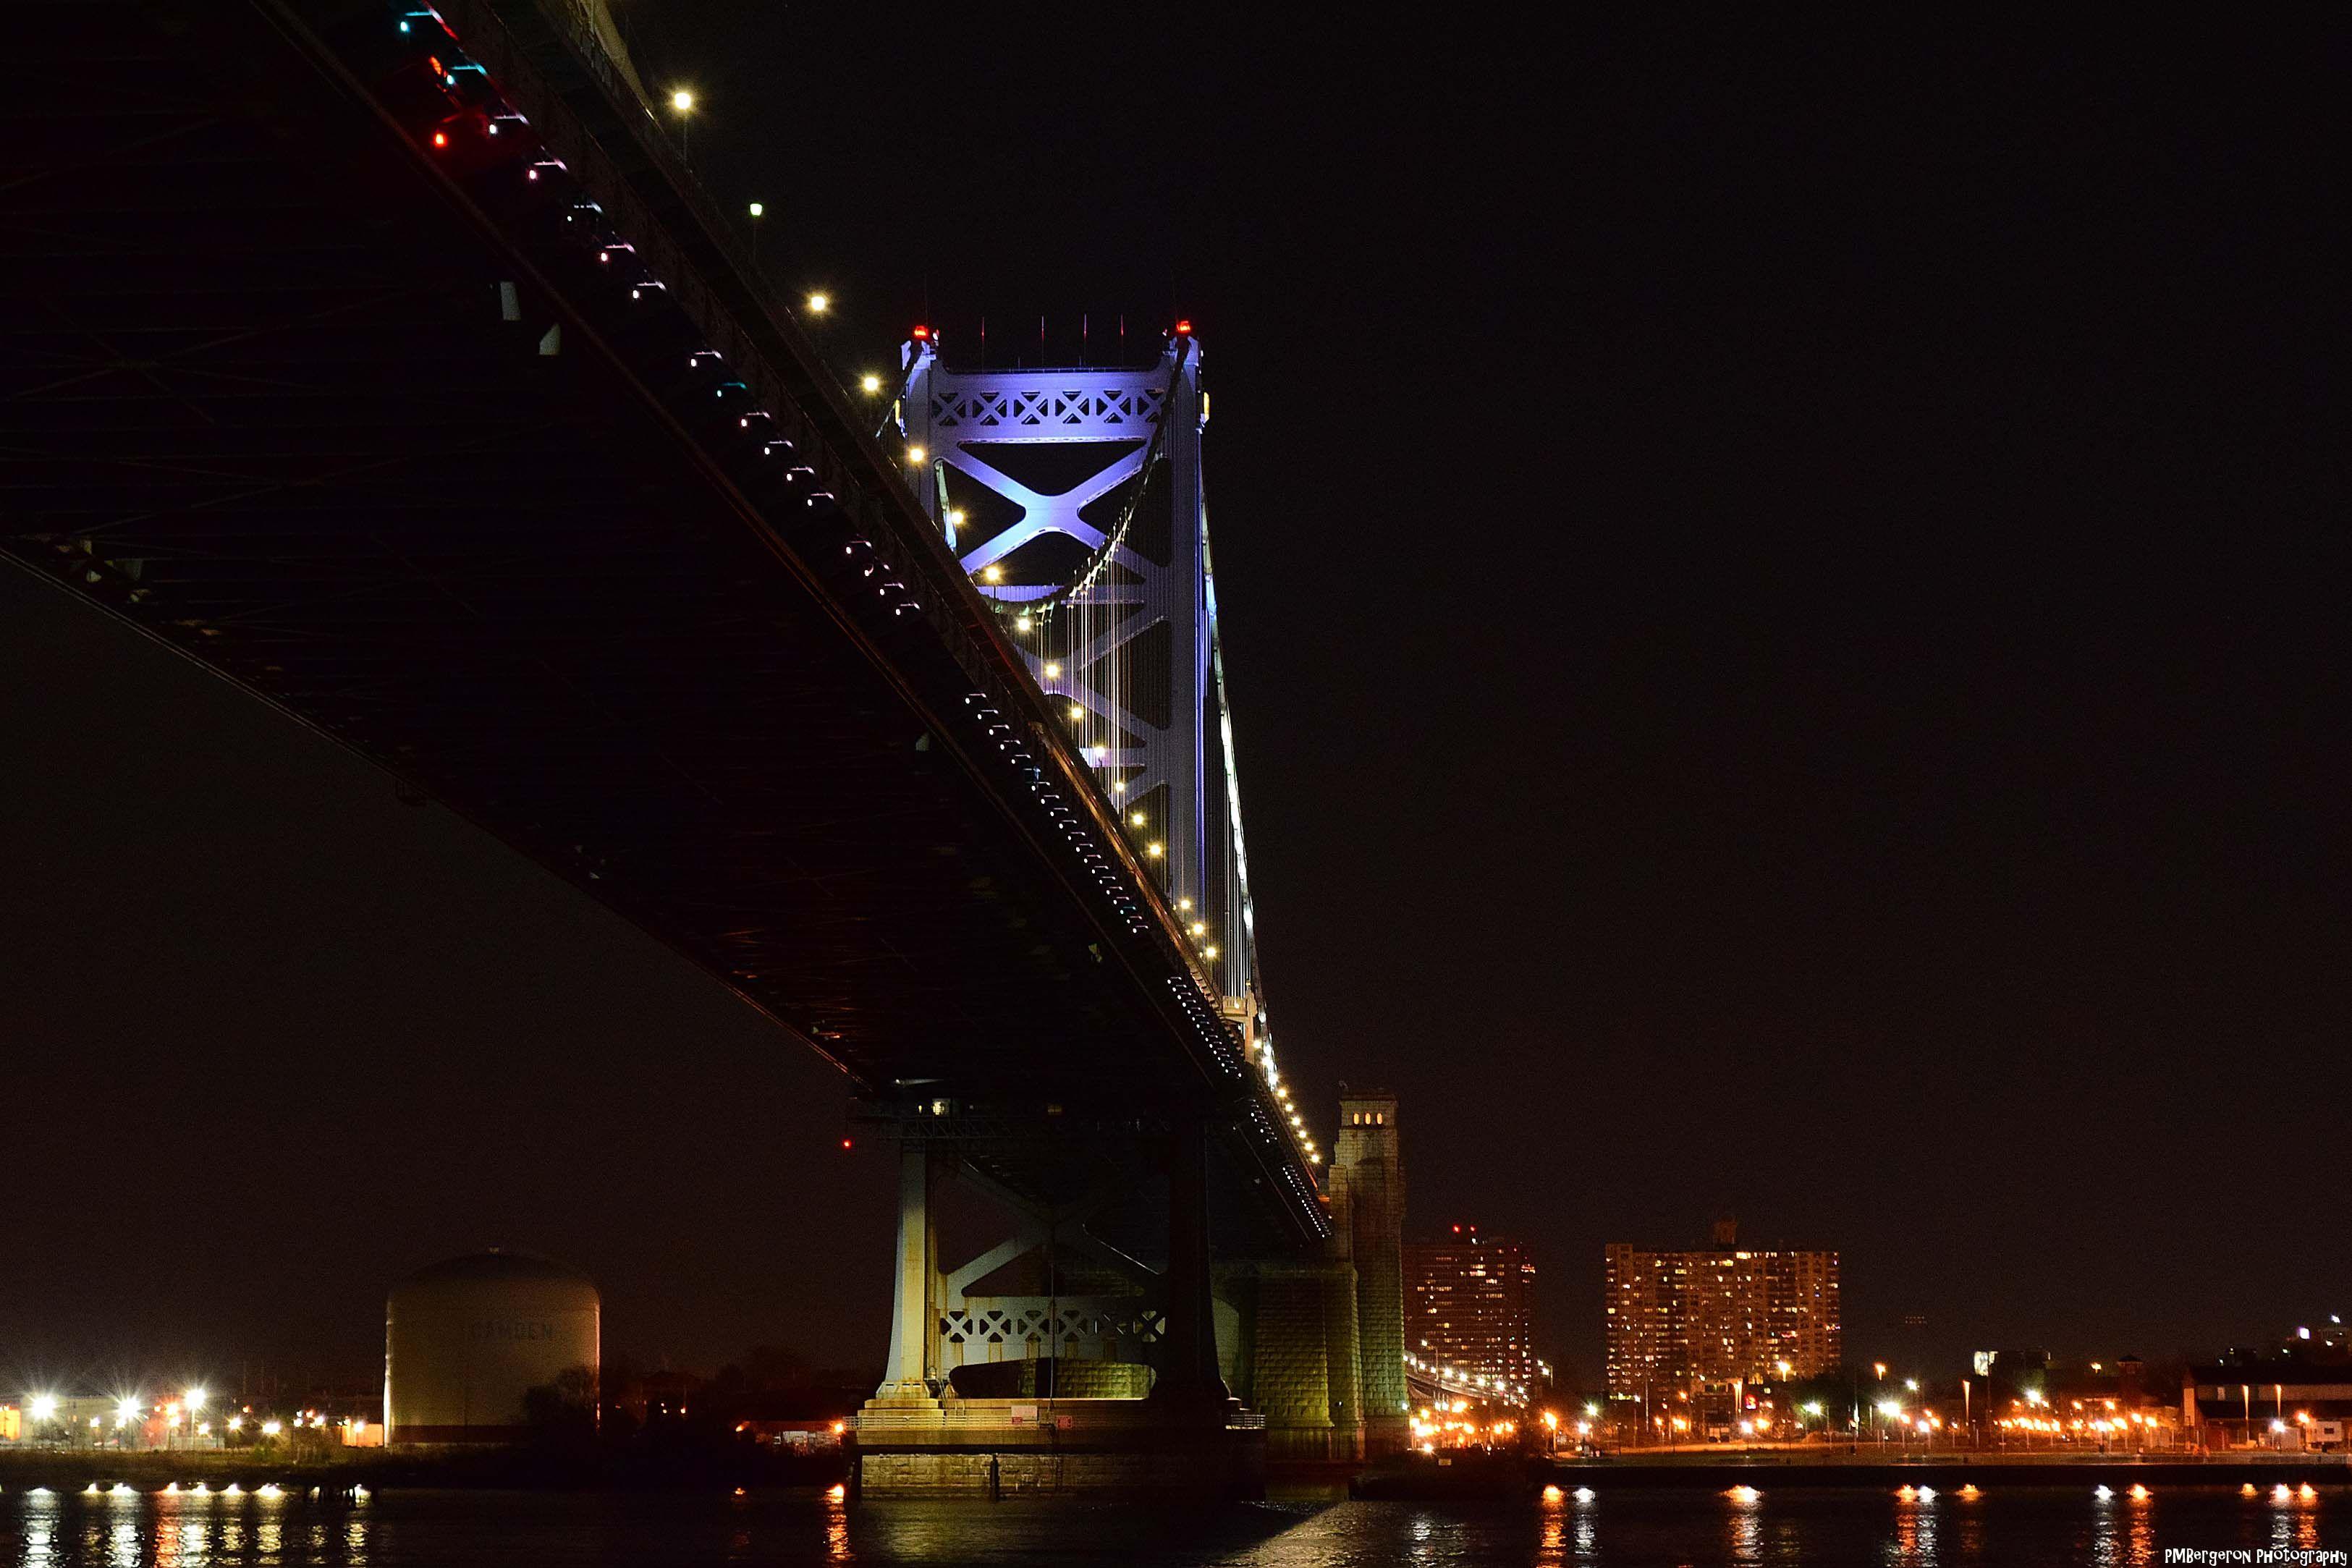 Ben franklin bridge on the camden nj side of the river